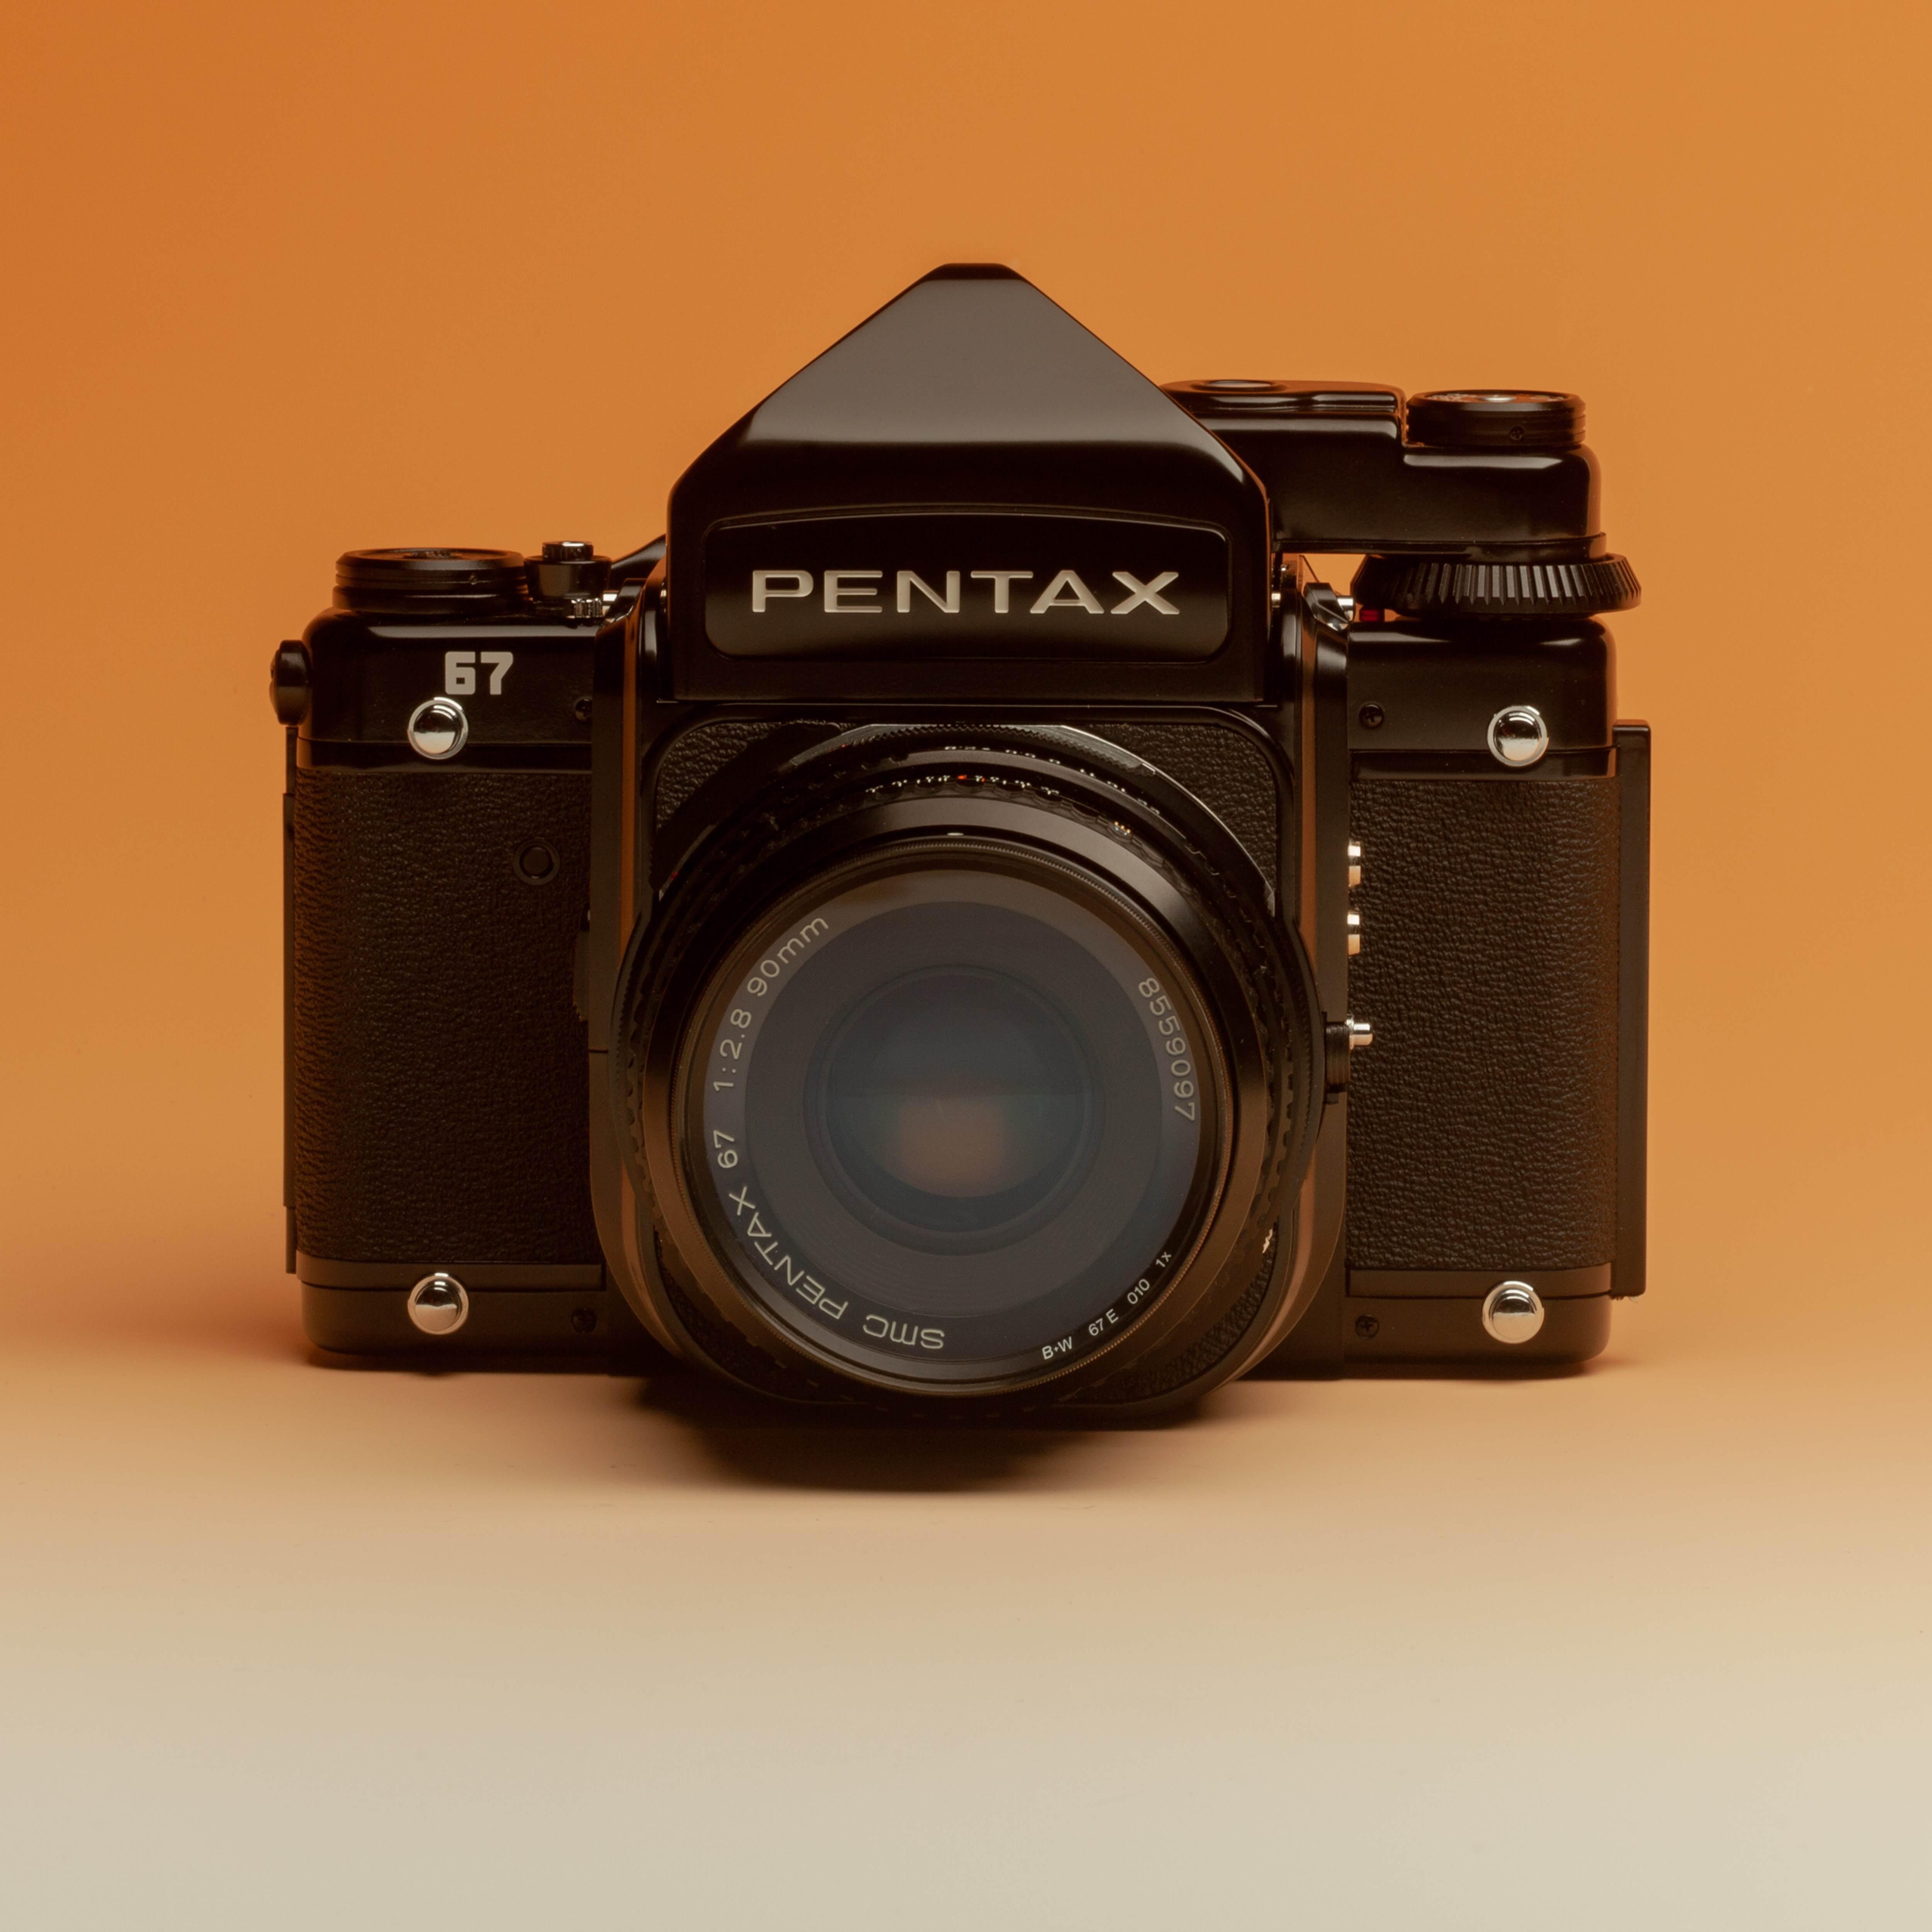 Pentax 67 + SMC 90mm f2,8 - Plane  Camera